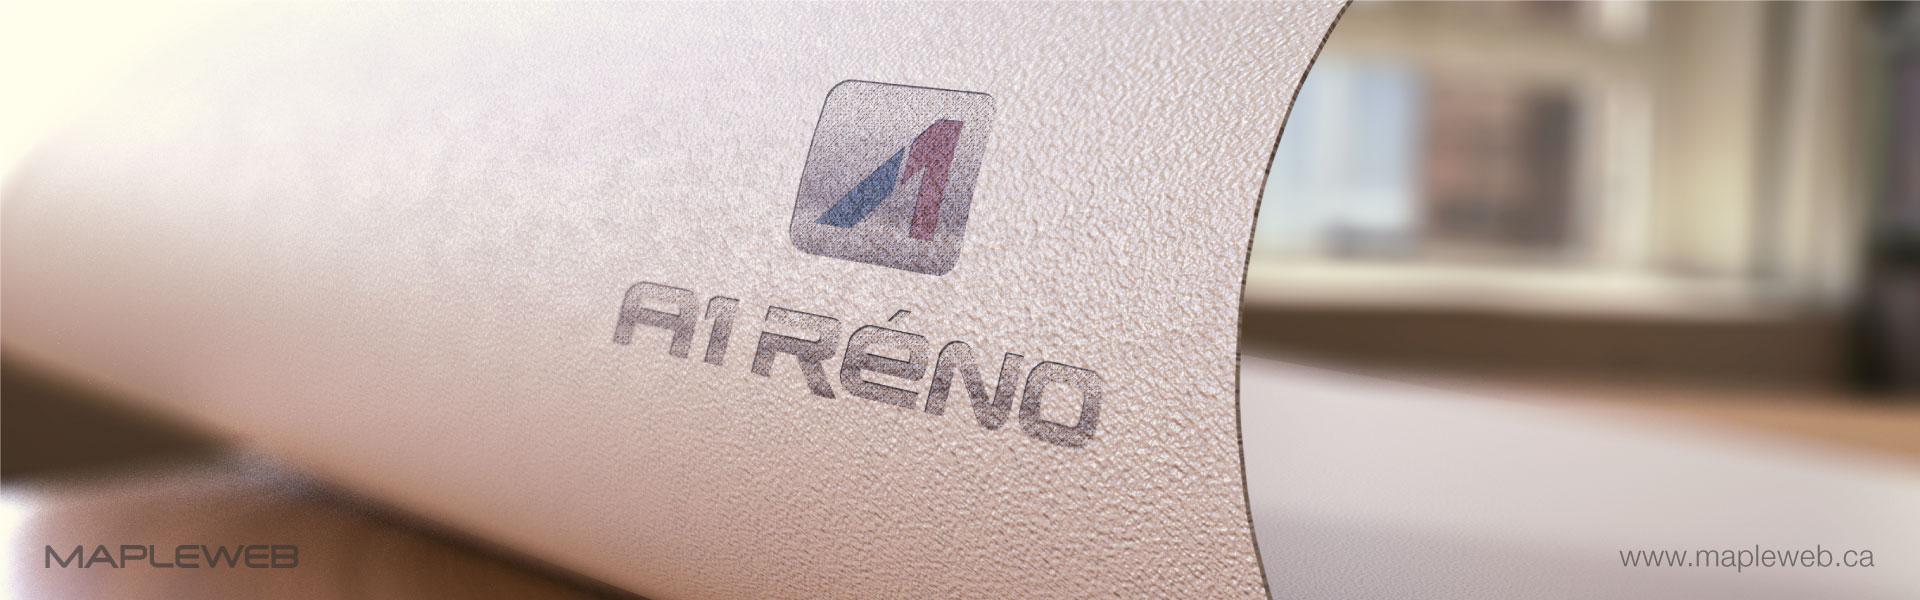 a1-reno-brand-logo-design-by-mapleweb-vancouver-canada-paper-mock